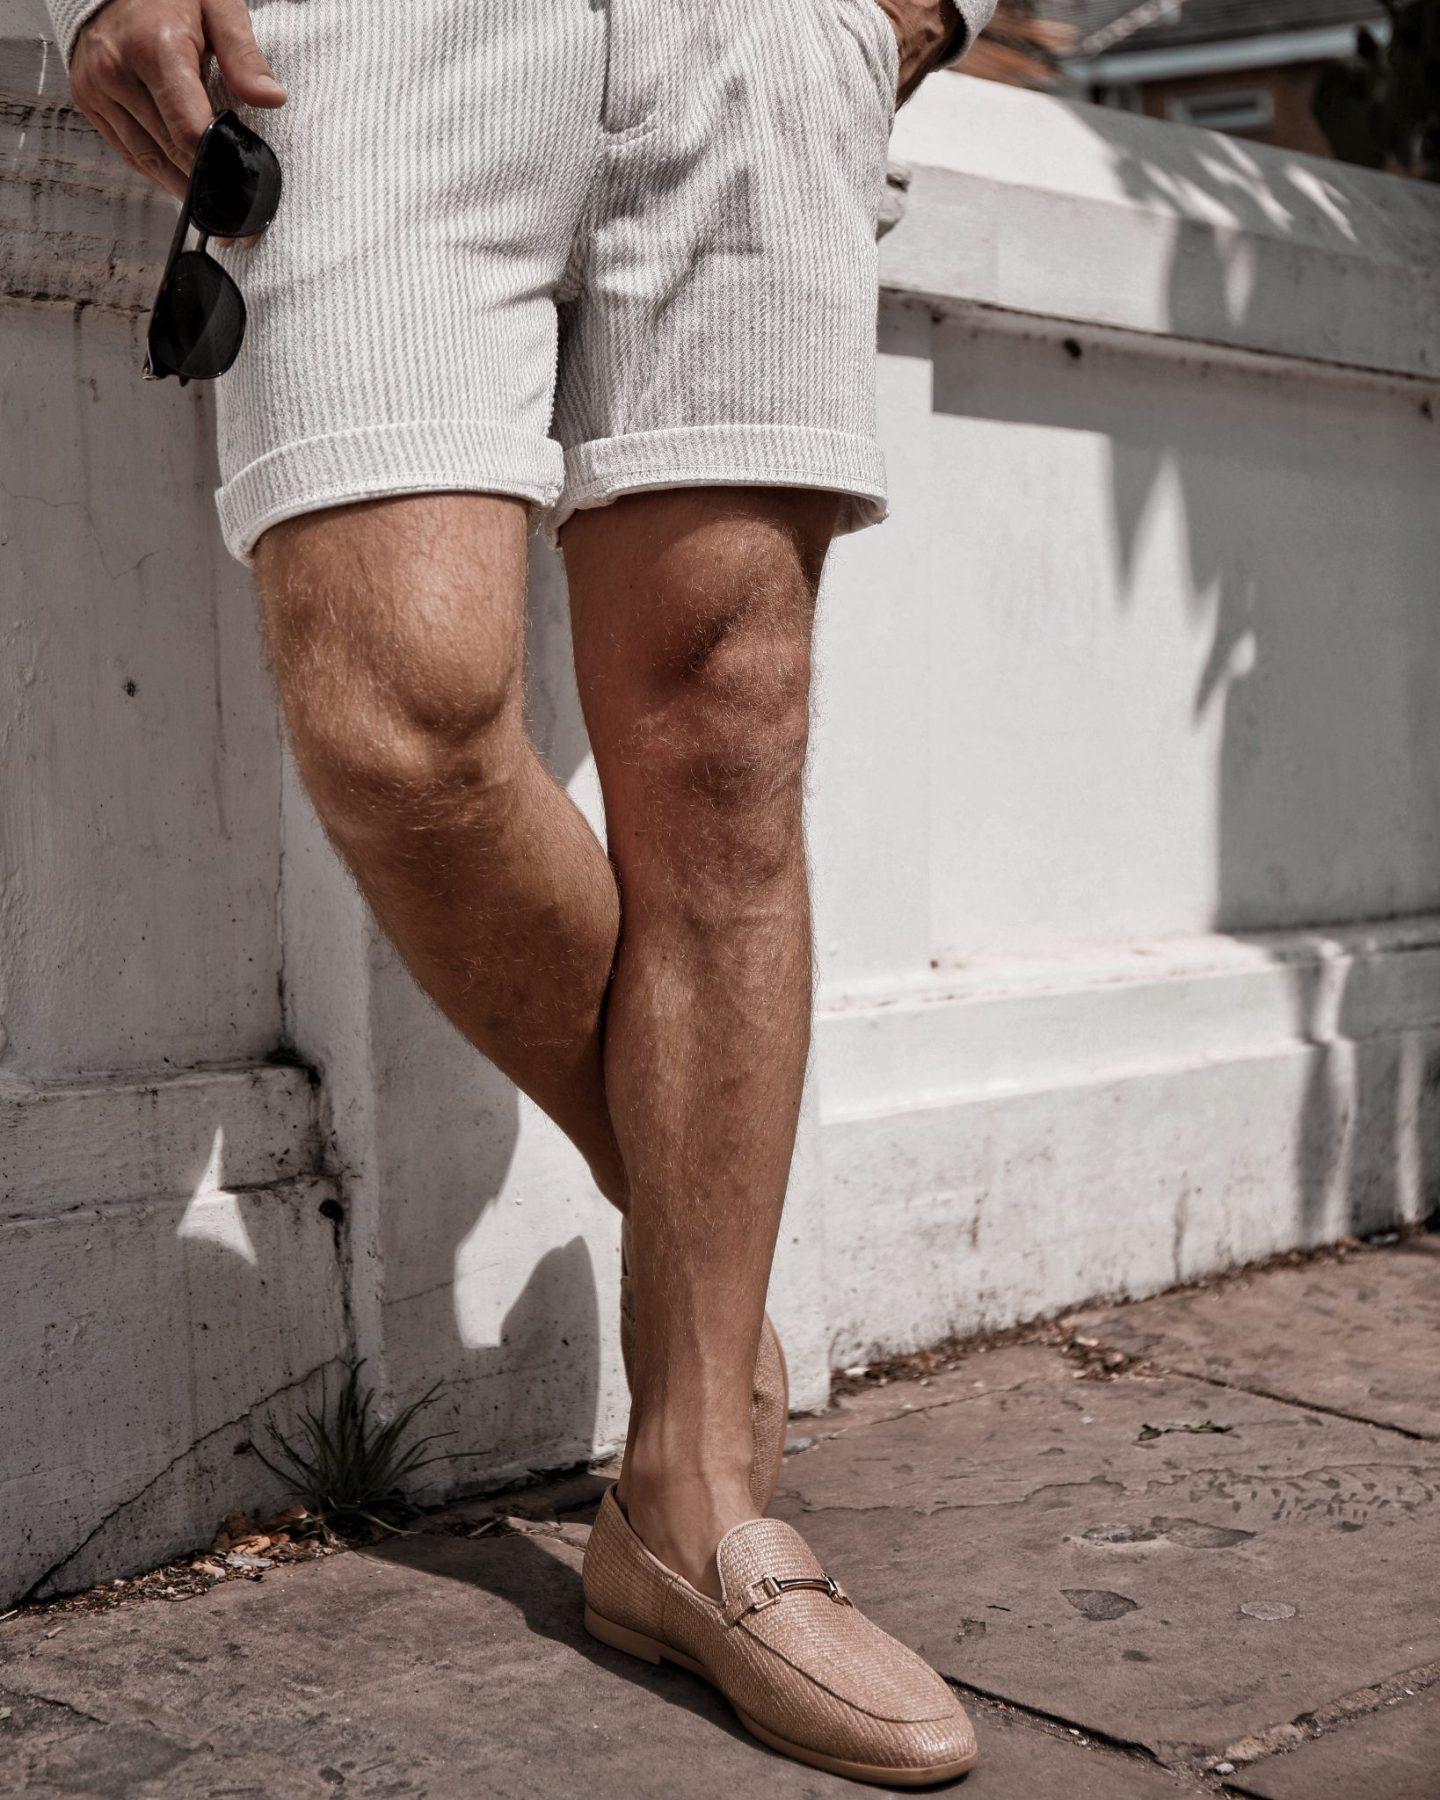 Zara Man Menswear Summer Co-Ord Sunny Hot OOTD